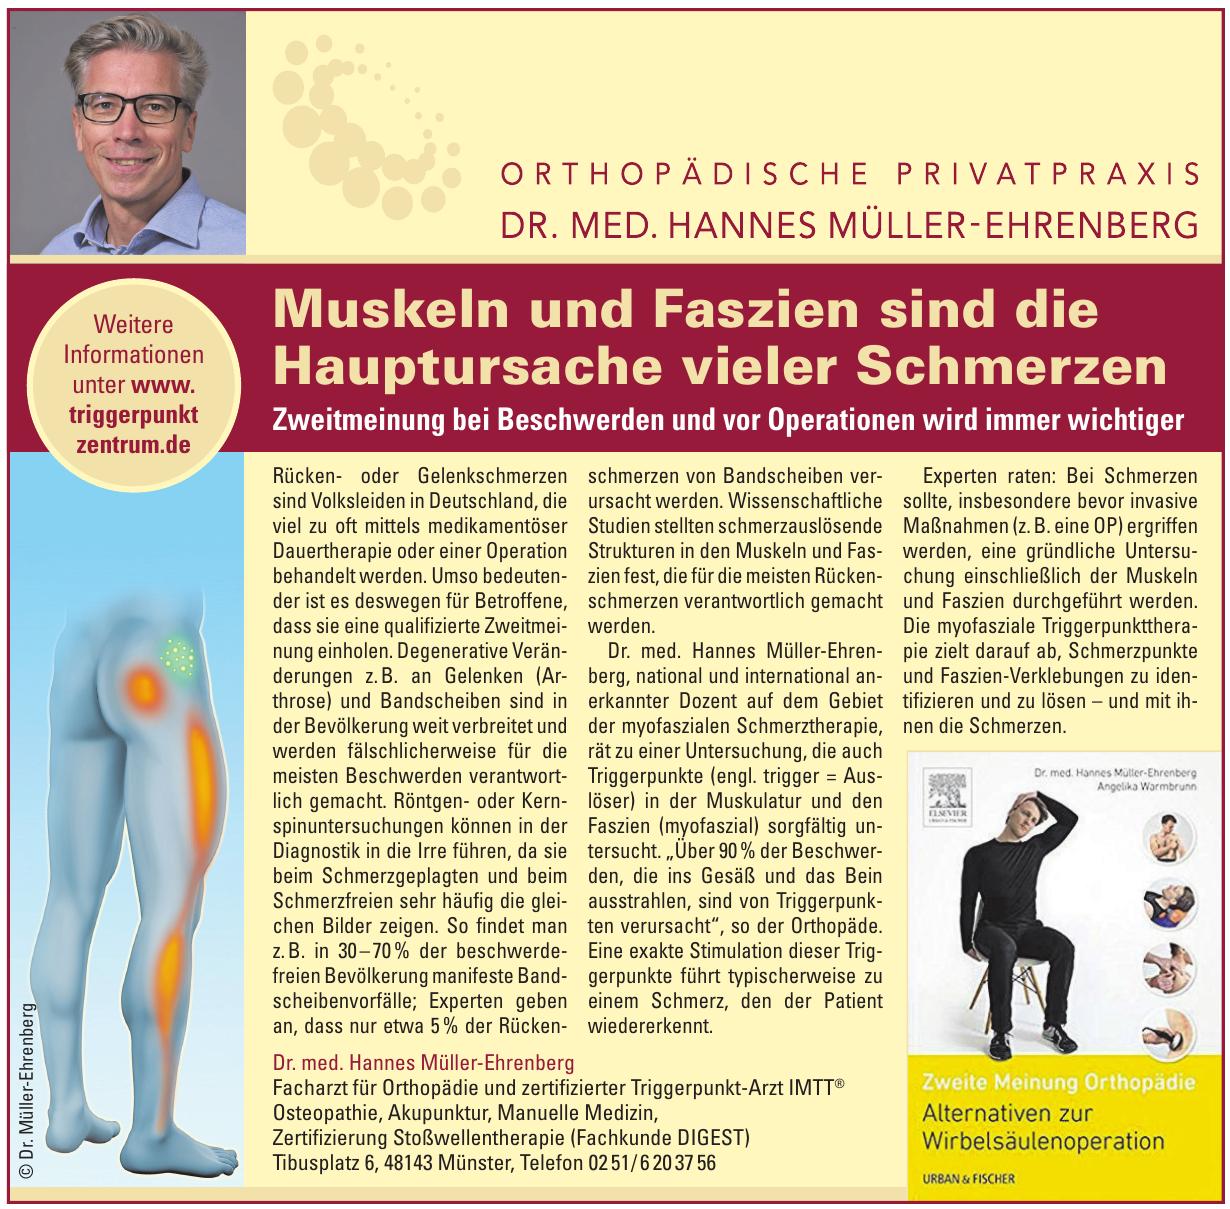 Dr. med. Hannes Mu?ller-Ehrenberg